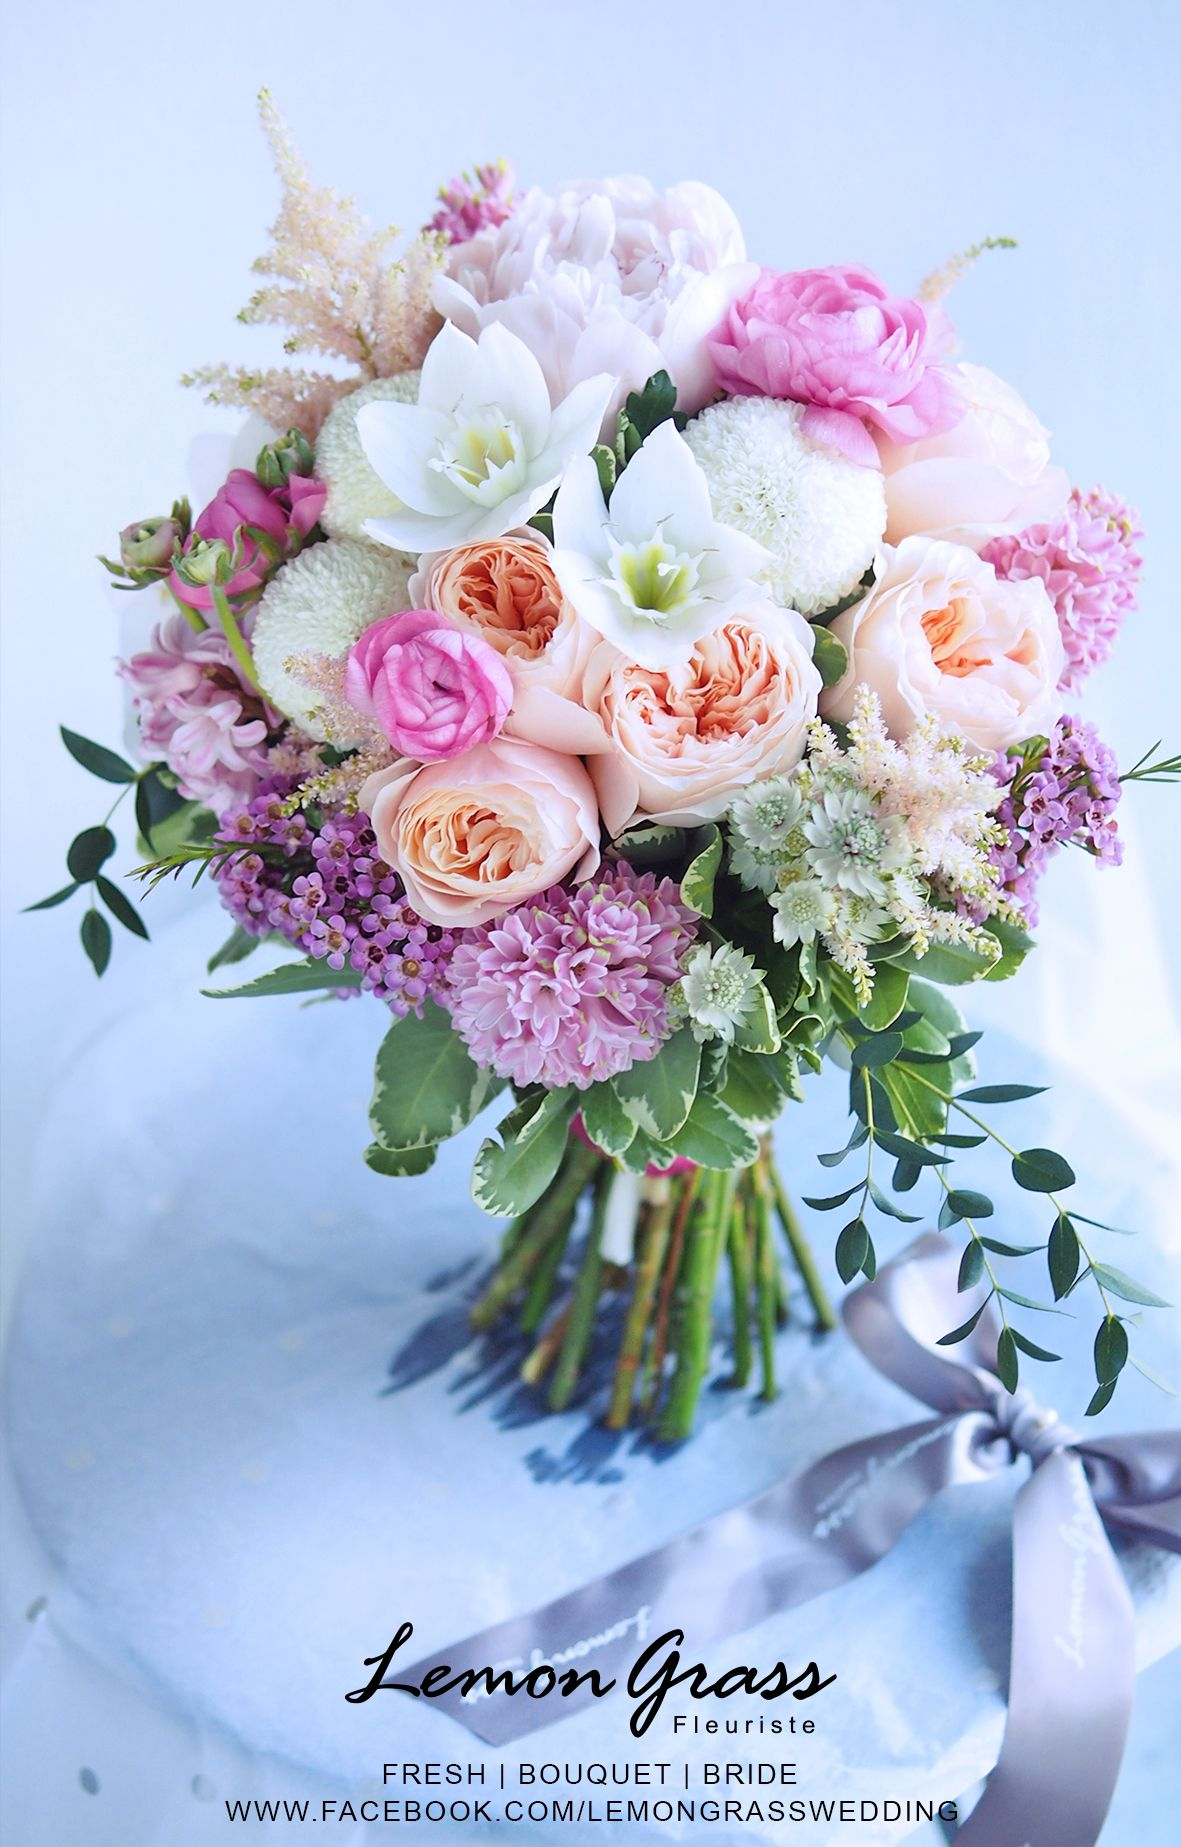 Follow Us Signaturebride On Twitter And On Facebook At Signature Bride Magazine Slub I Wesele Bukiet Slubny Kompozycje Kwiatowe